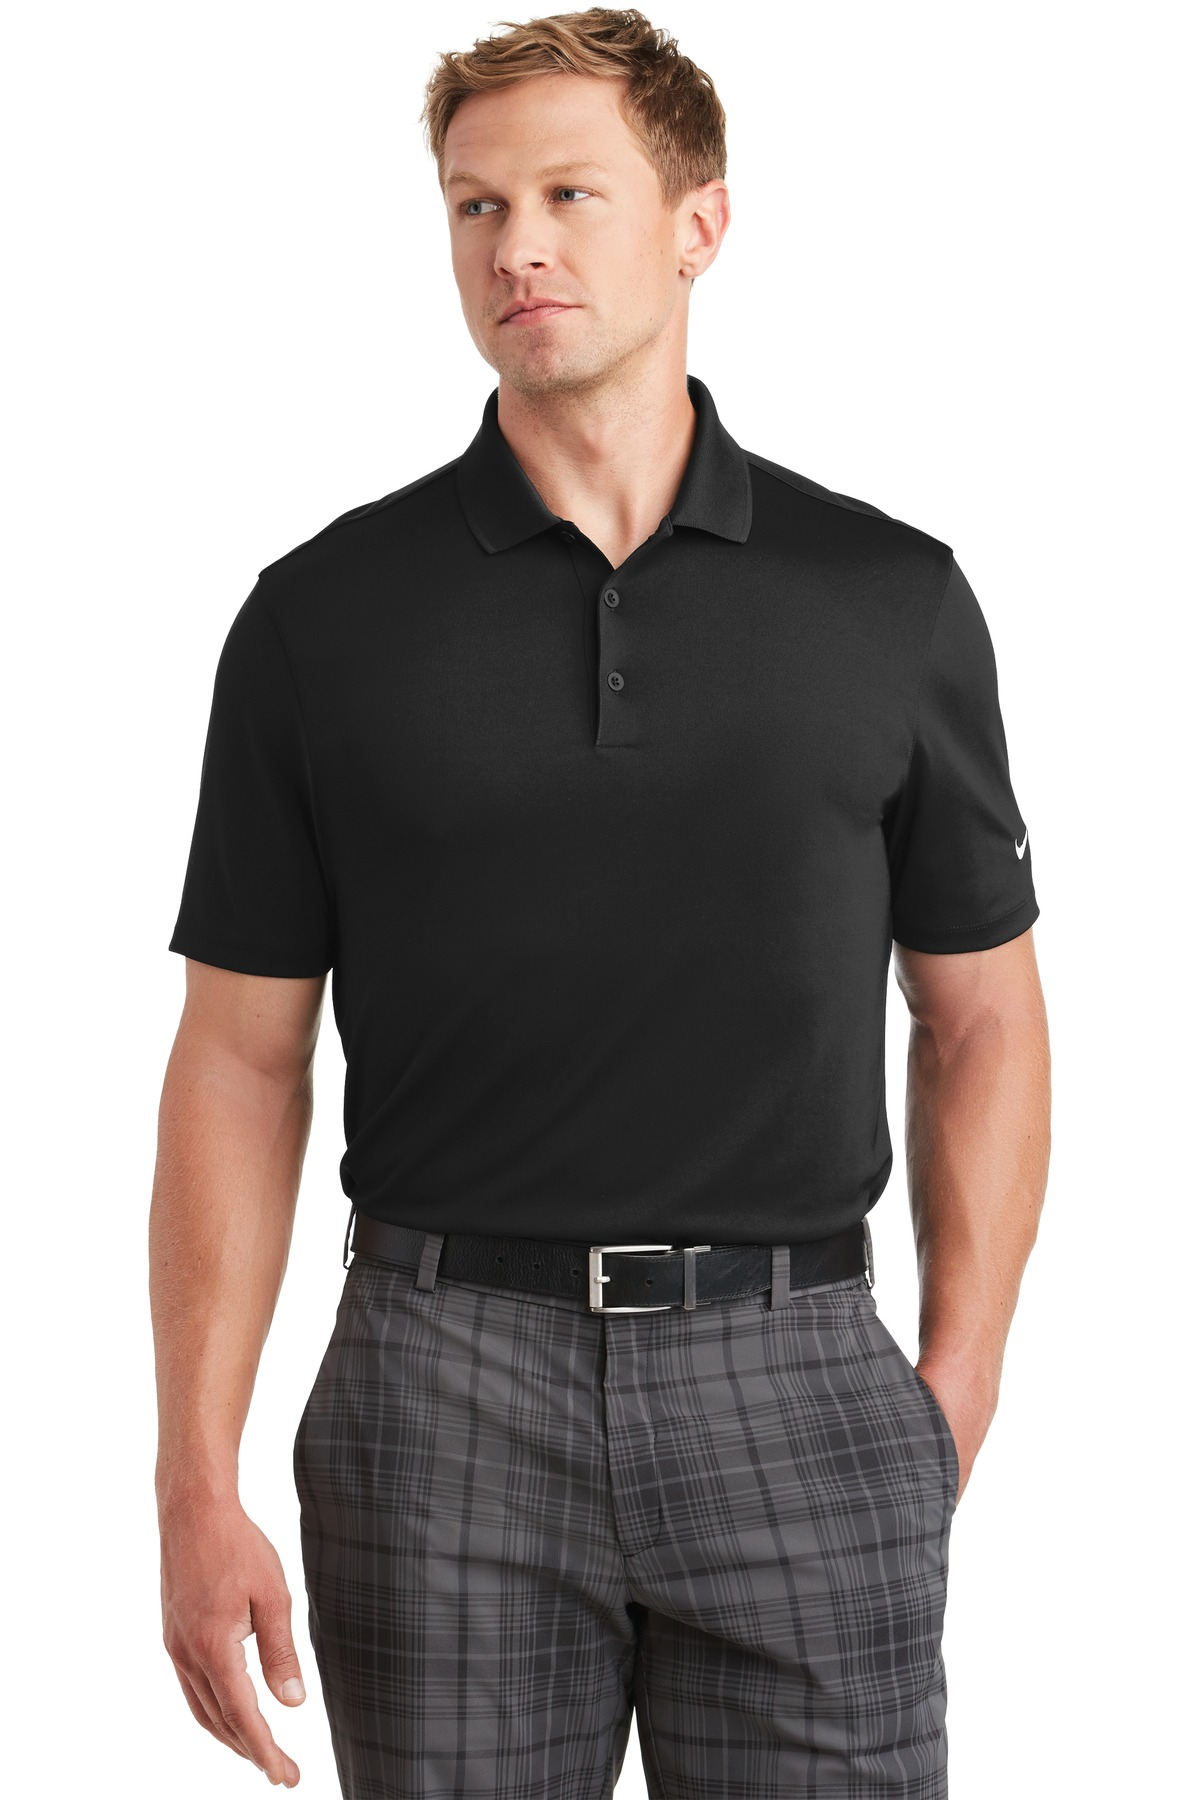 705342876-120 - Nike Golf Dri-FIT Players Polo w/Flat Knit Collar - thumbnail